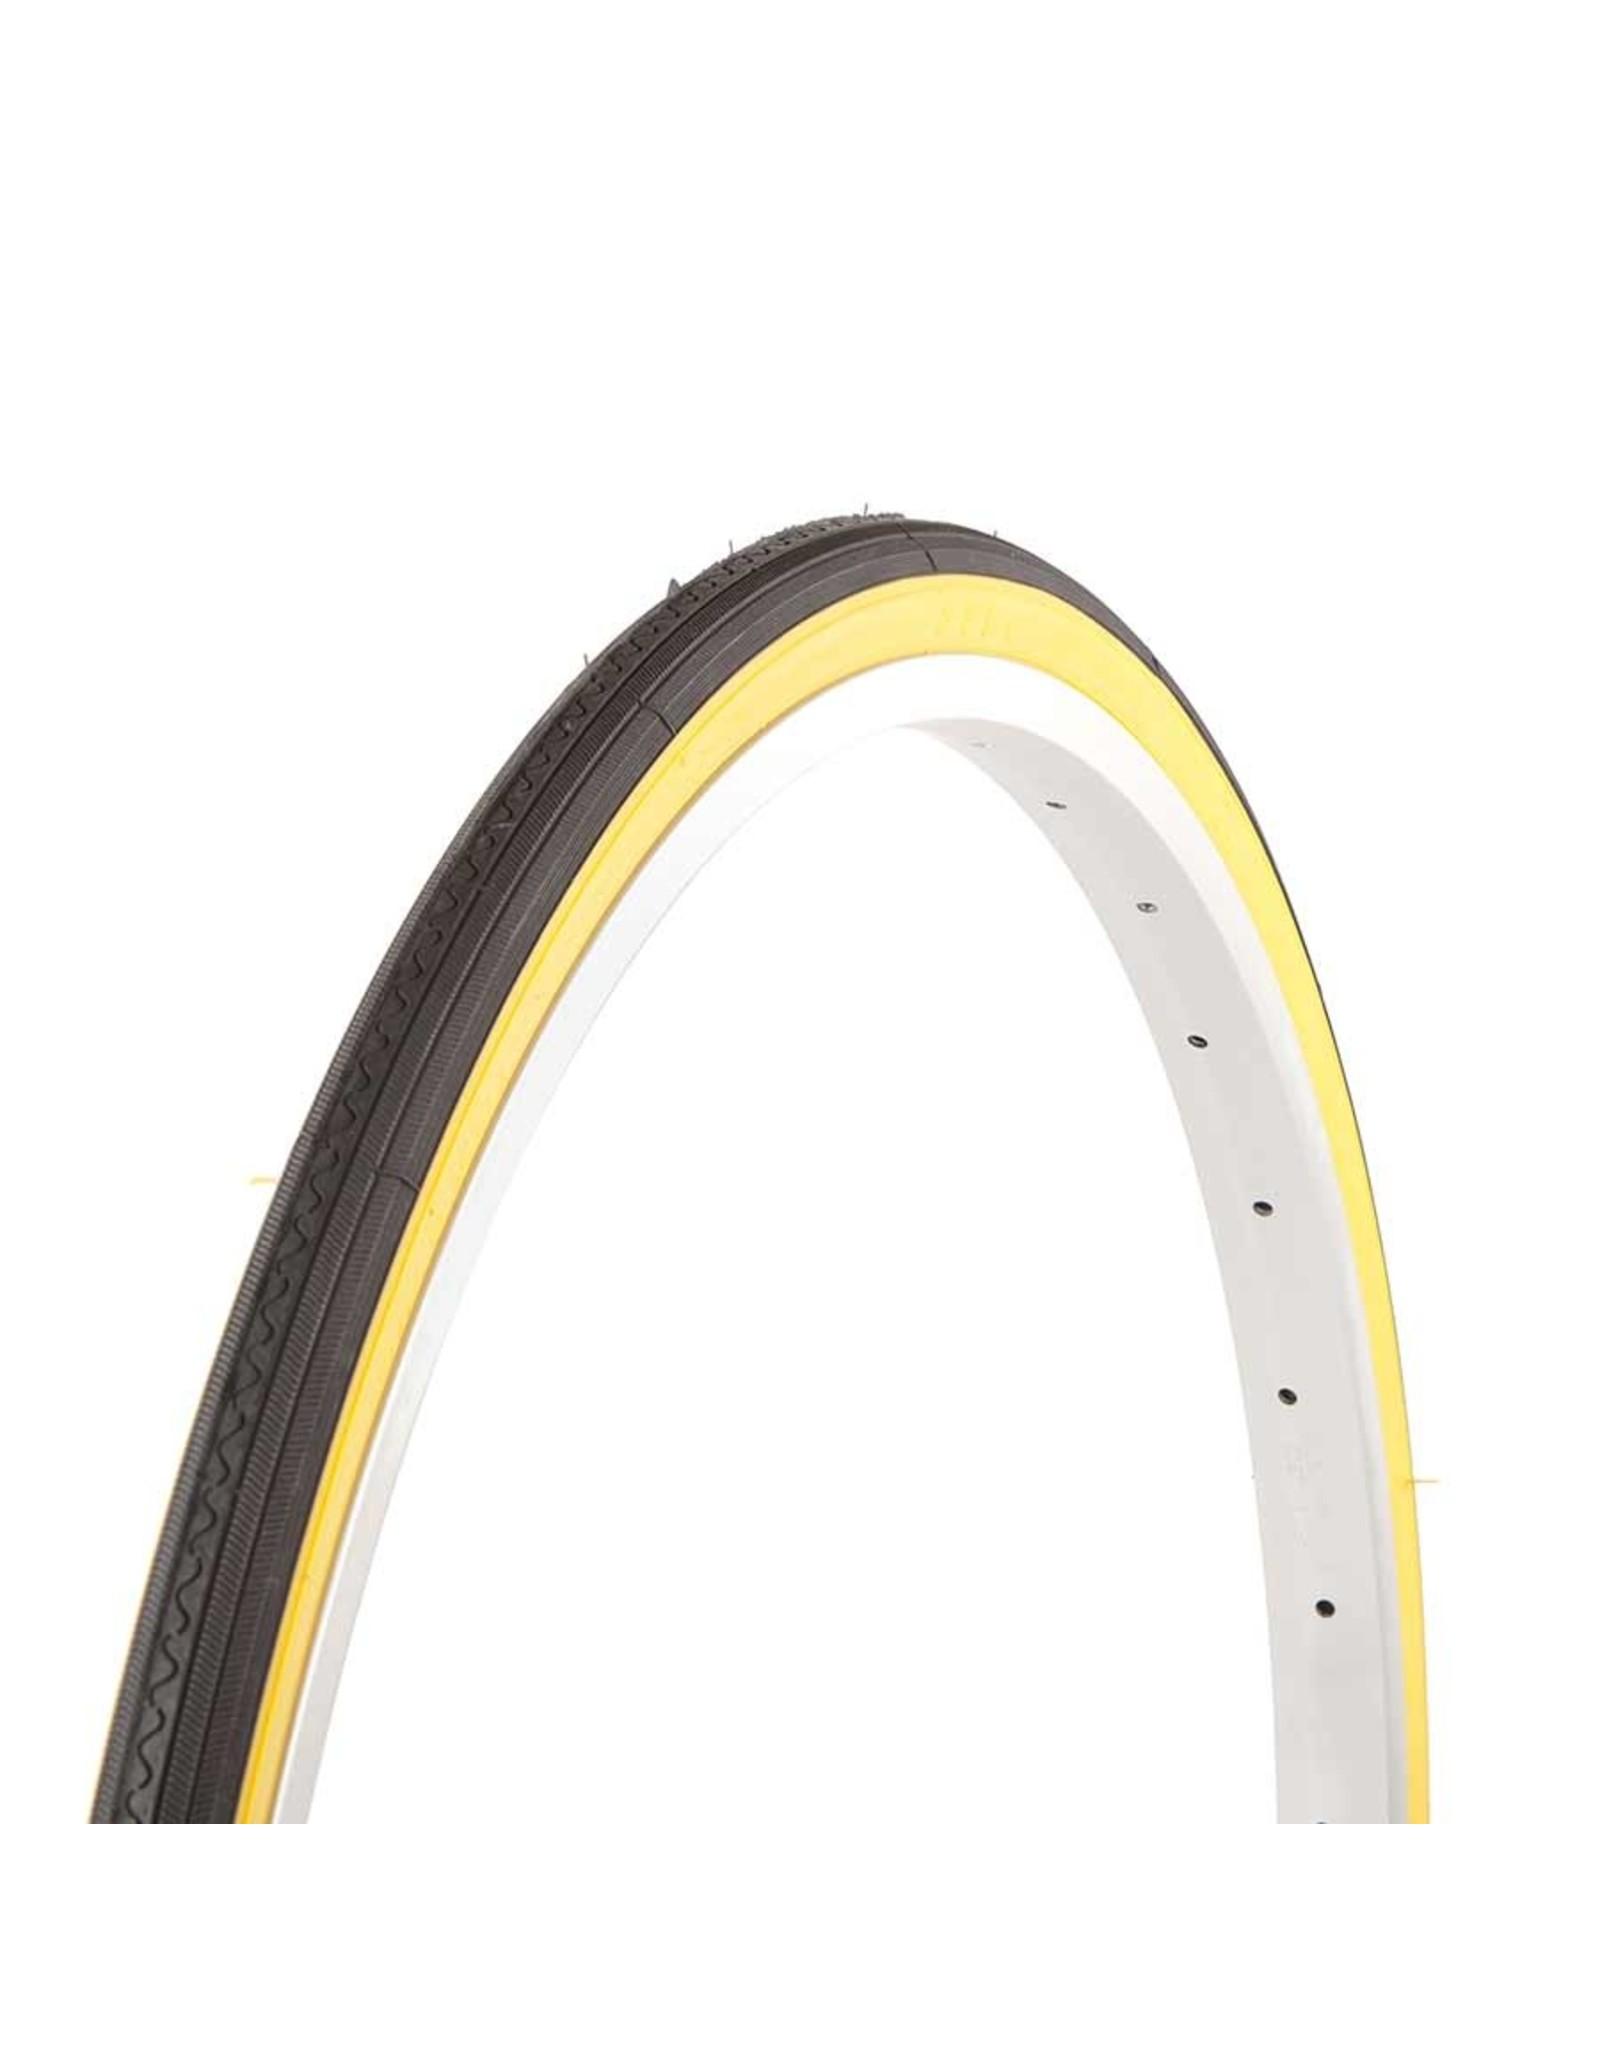 EVO, Dash, Tire, 26''x1-3/8, Wire, Clincher, Beige